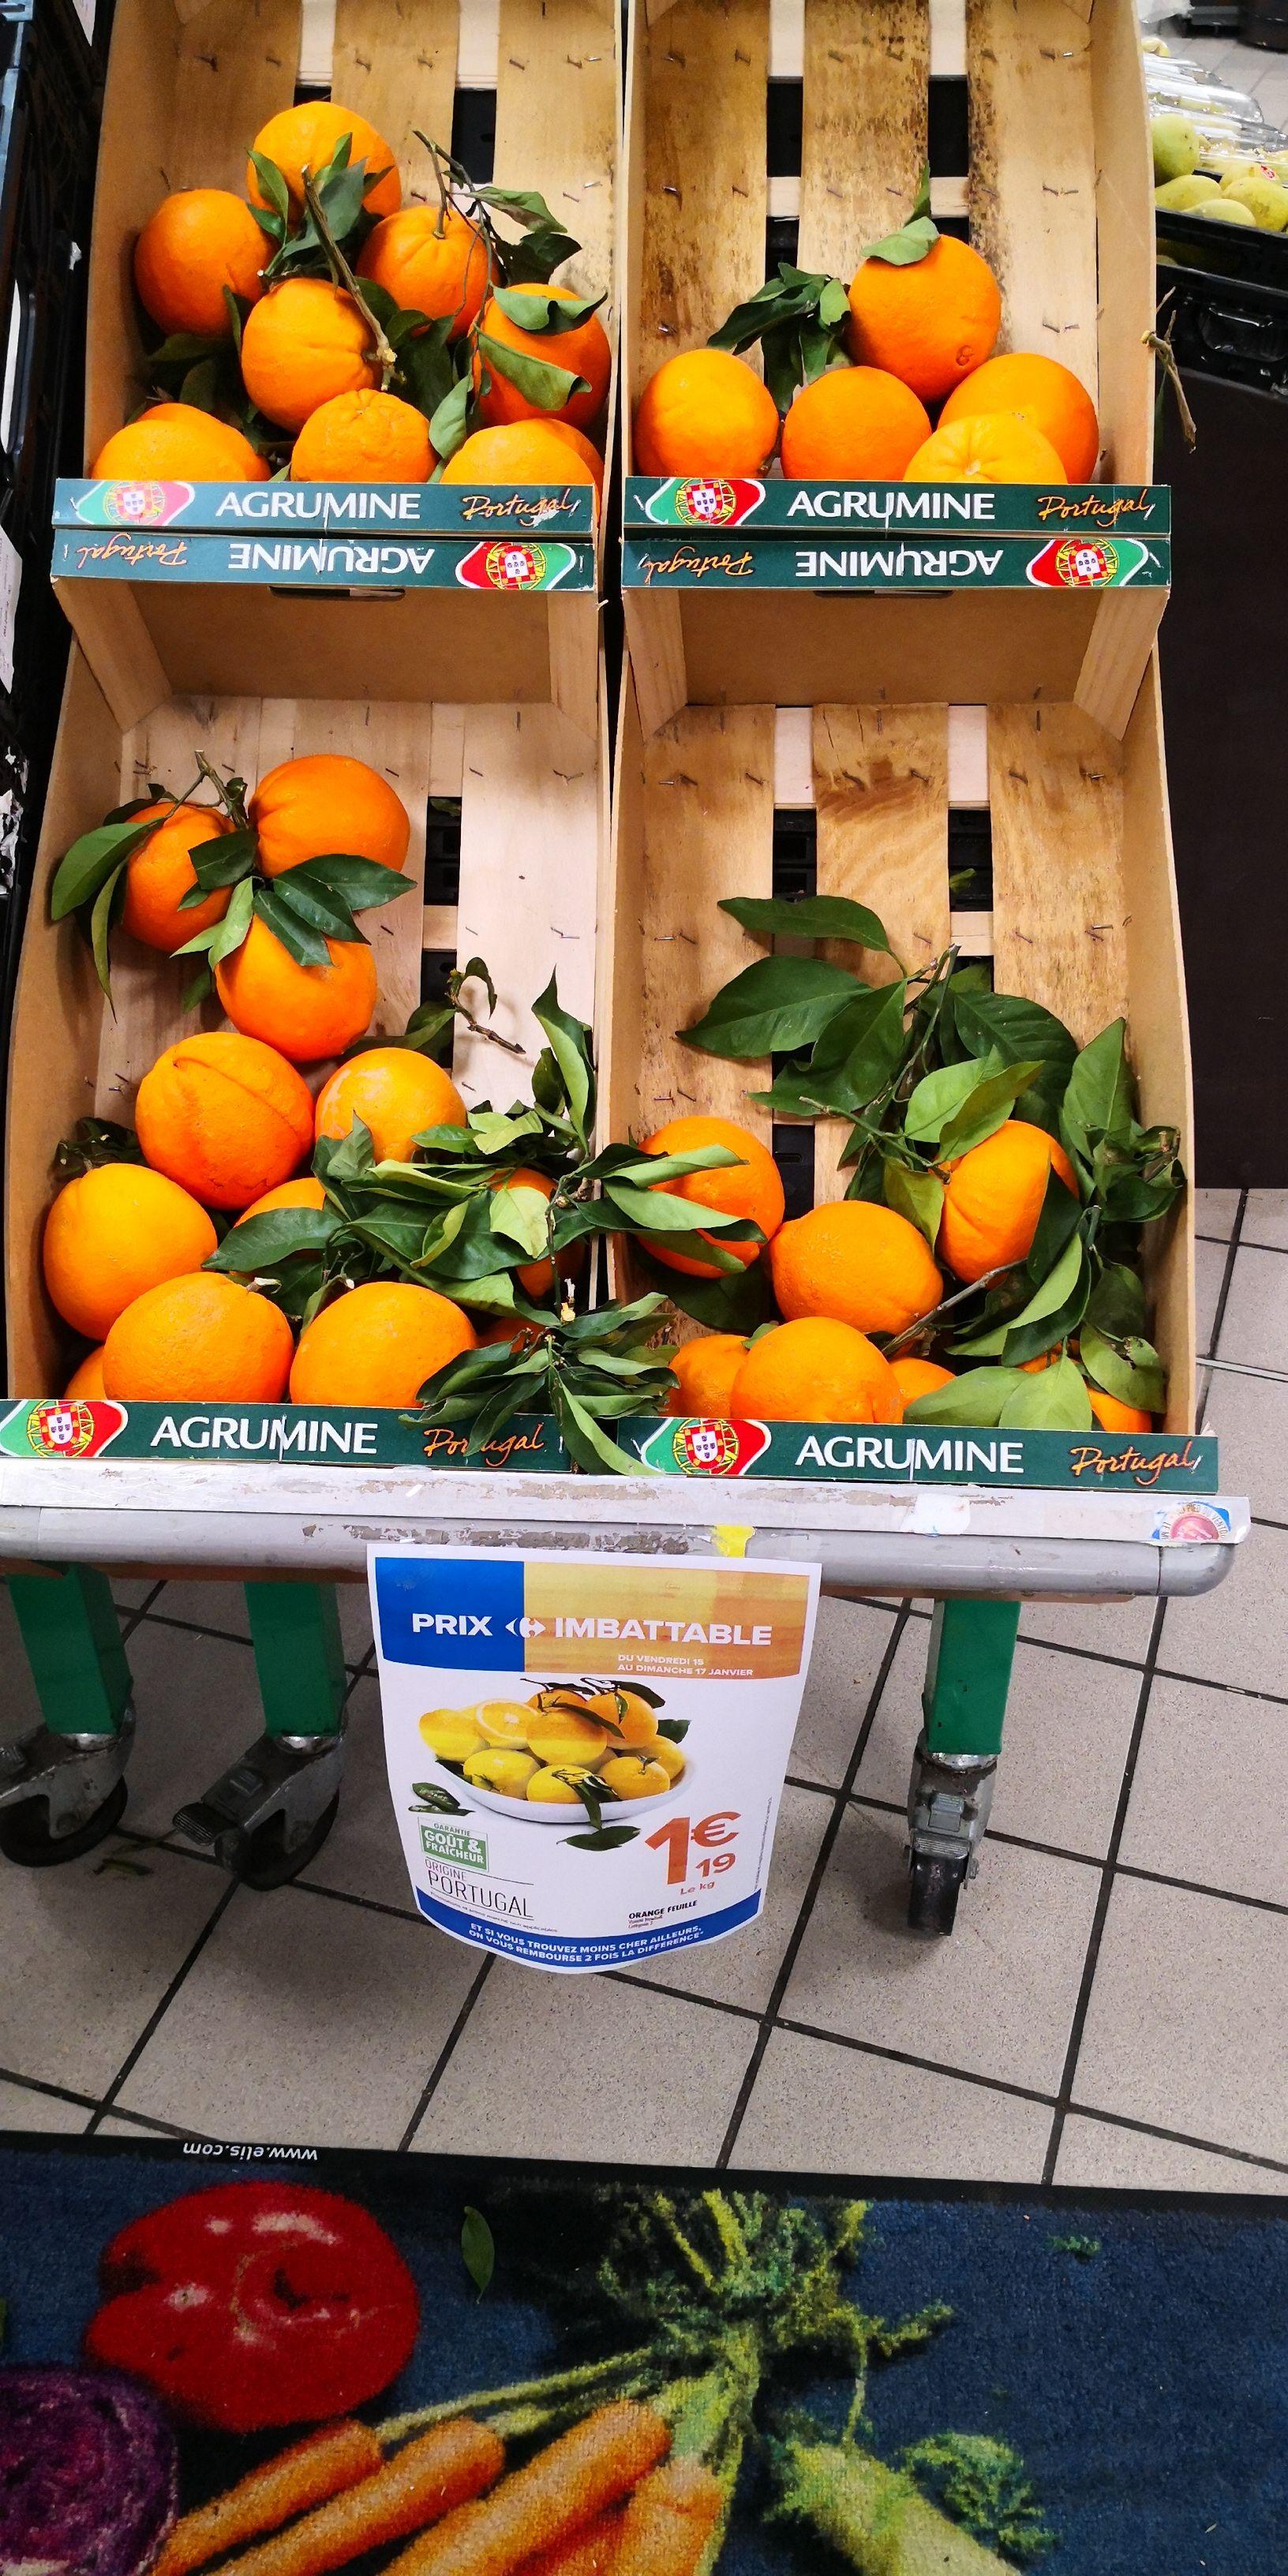 Oranges feuilles, origine Portugal - 1kg (Cannes 06 et national)